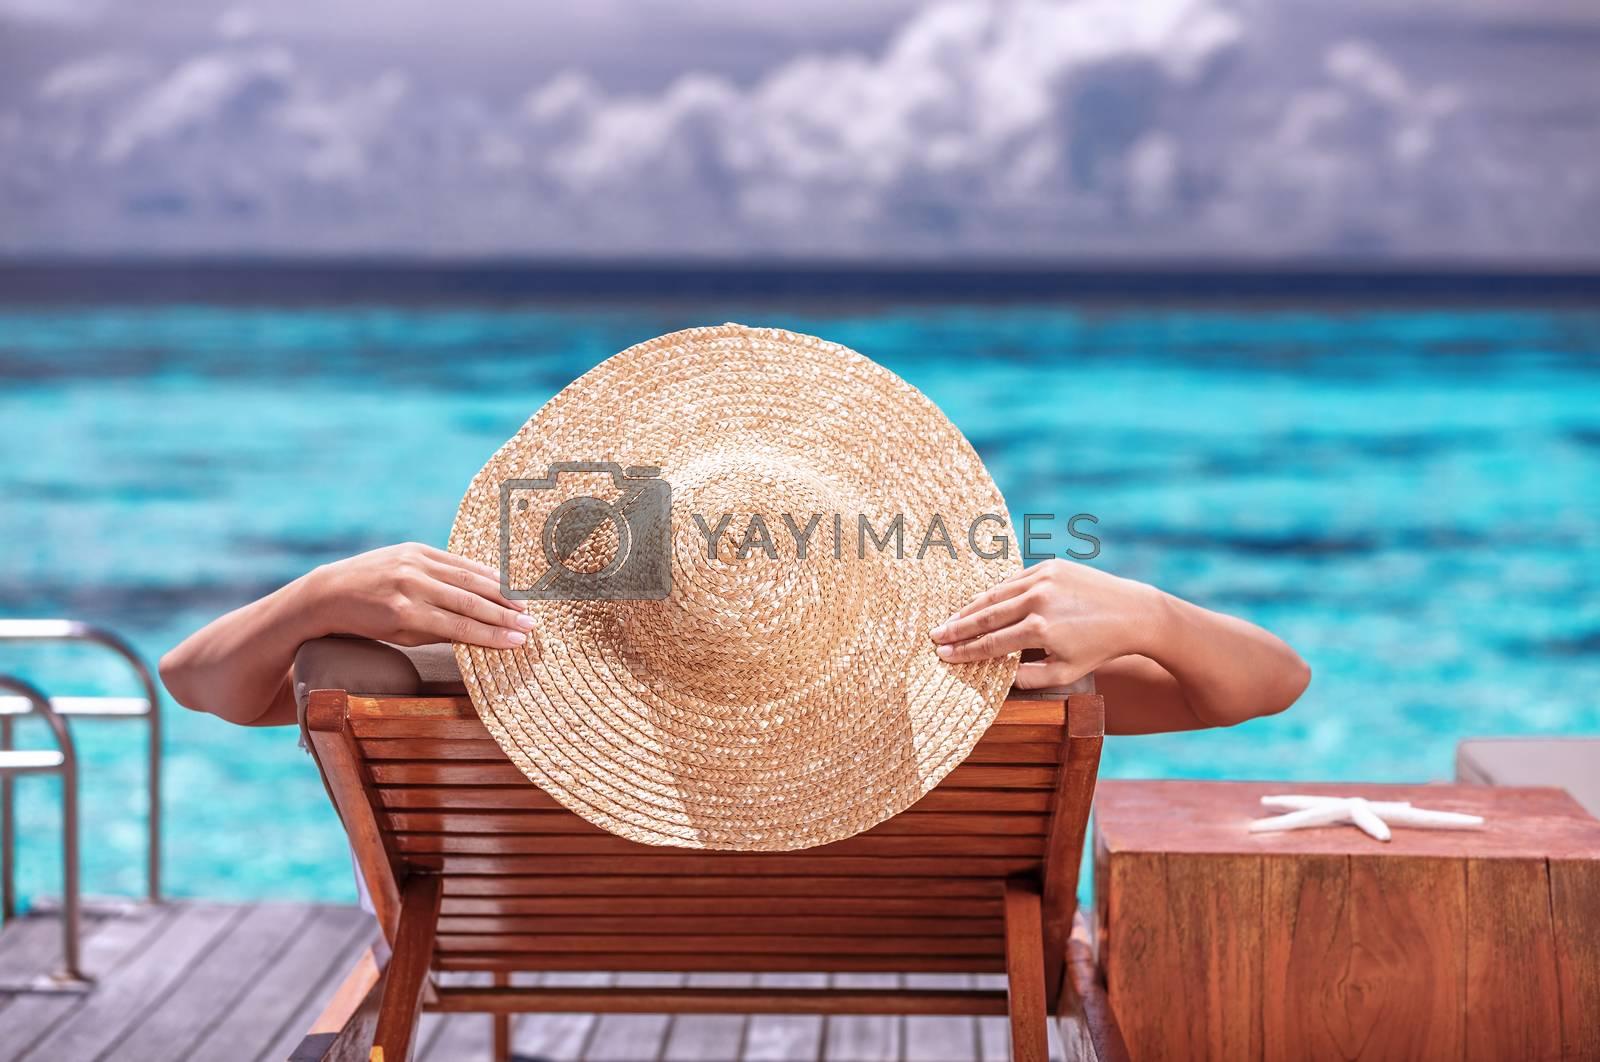 Luxury female tanning on the beach, wearing big stylish hat, enjoying beautiful seascape, summer travel and tourism concept